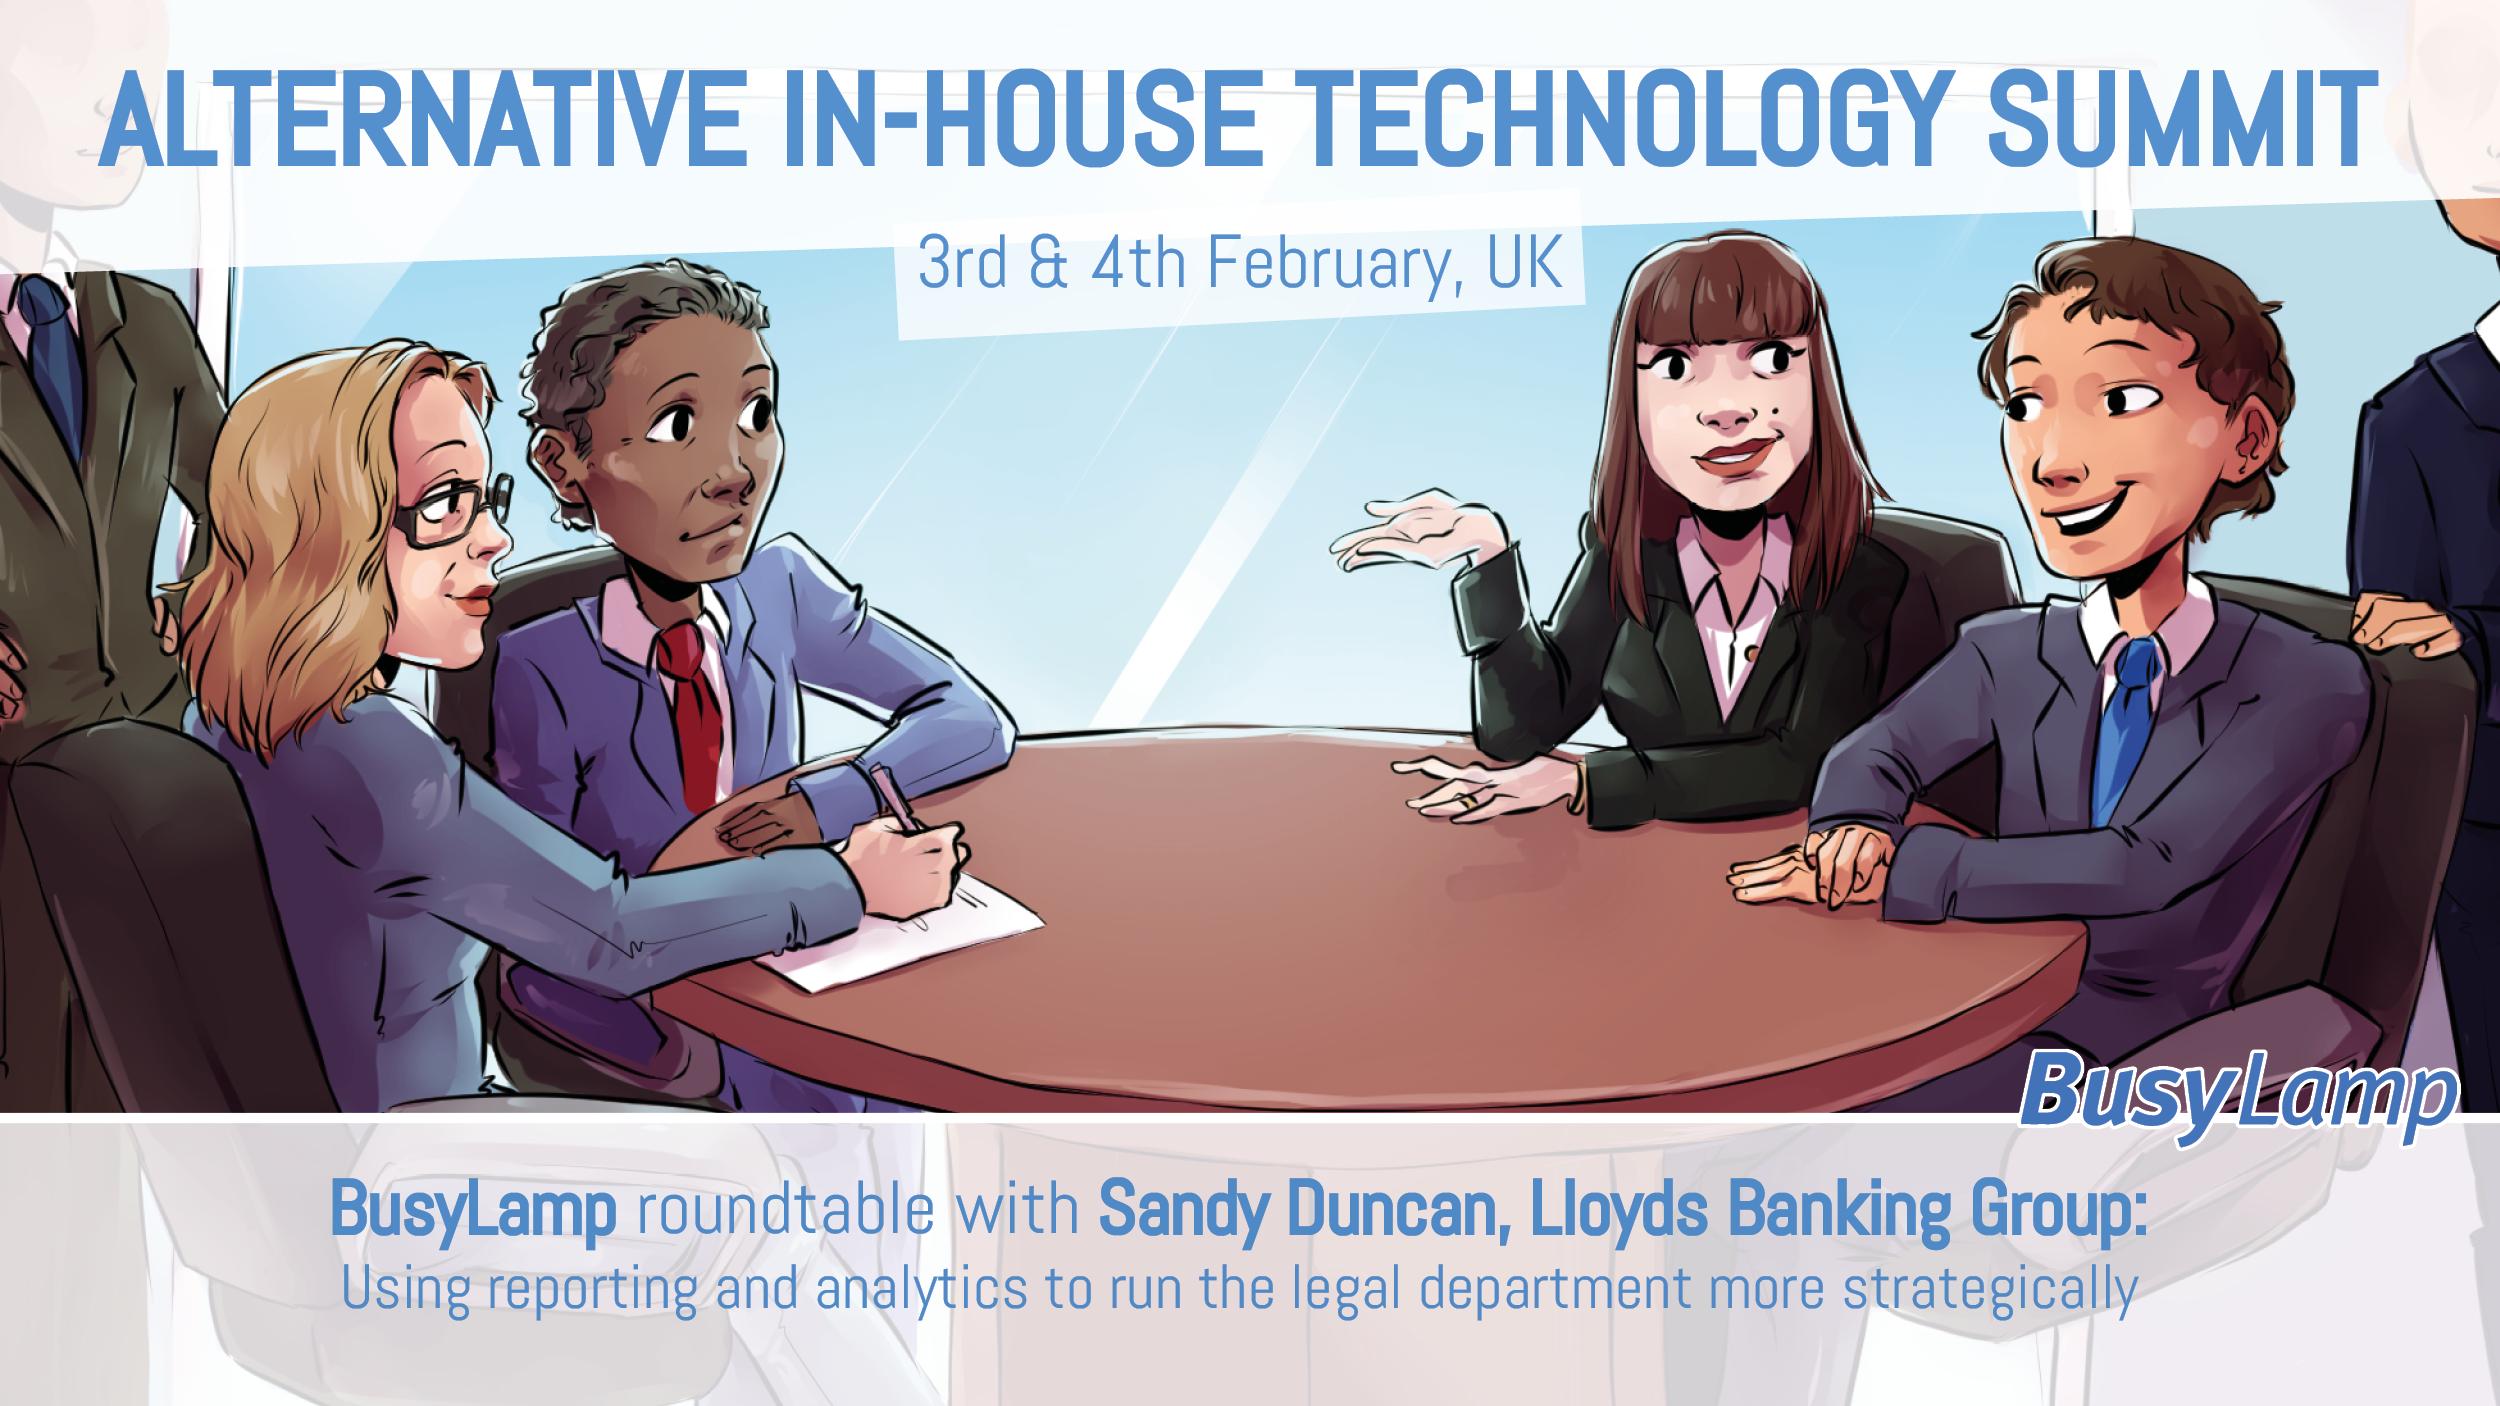 Alternative In-House Technology Summit BusyLamp